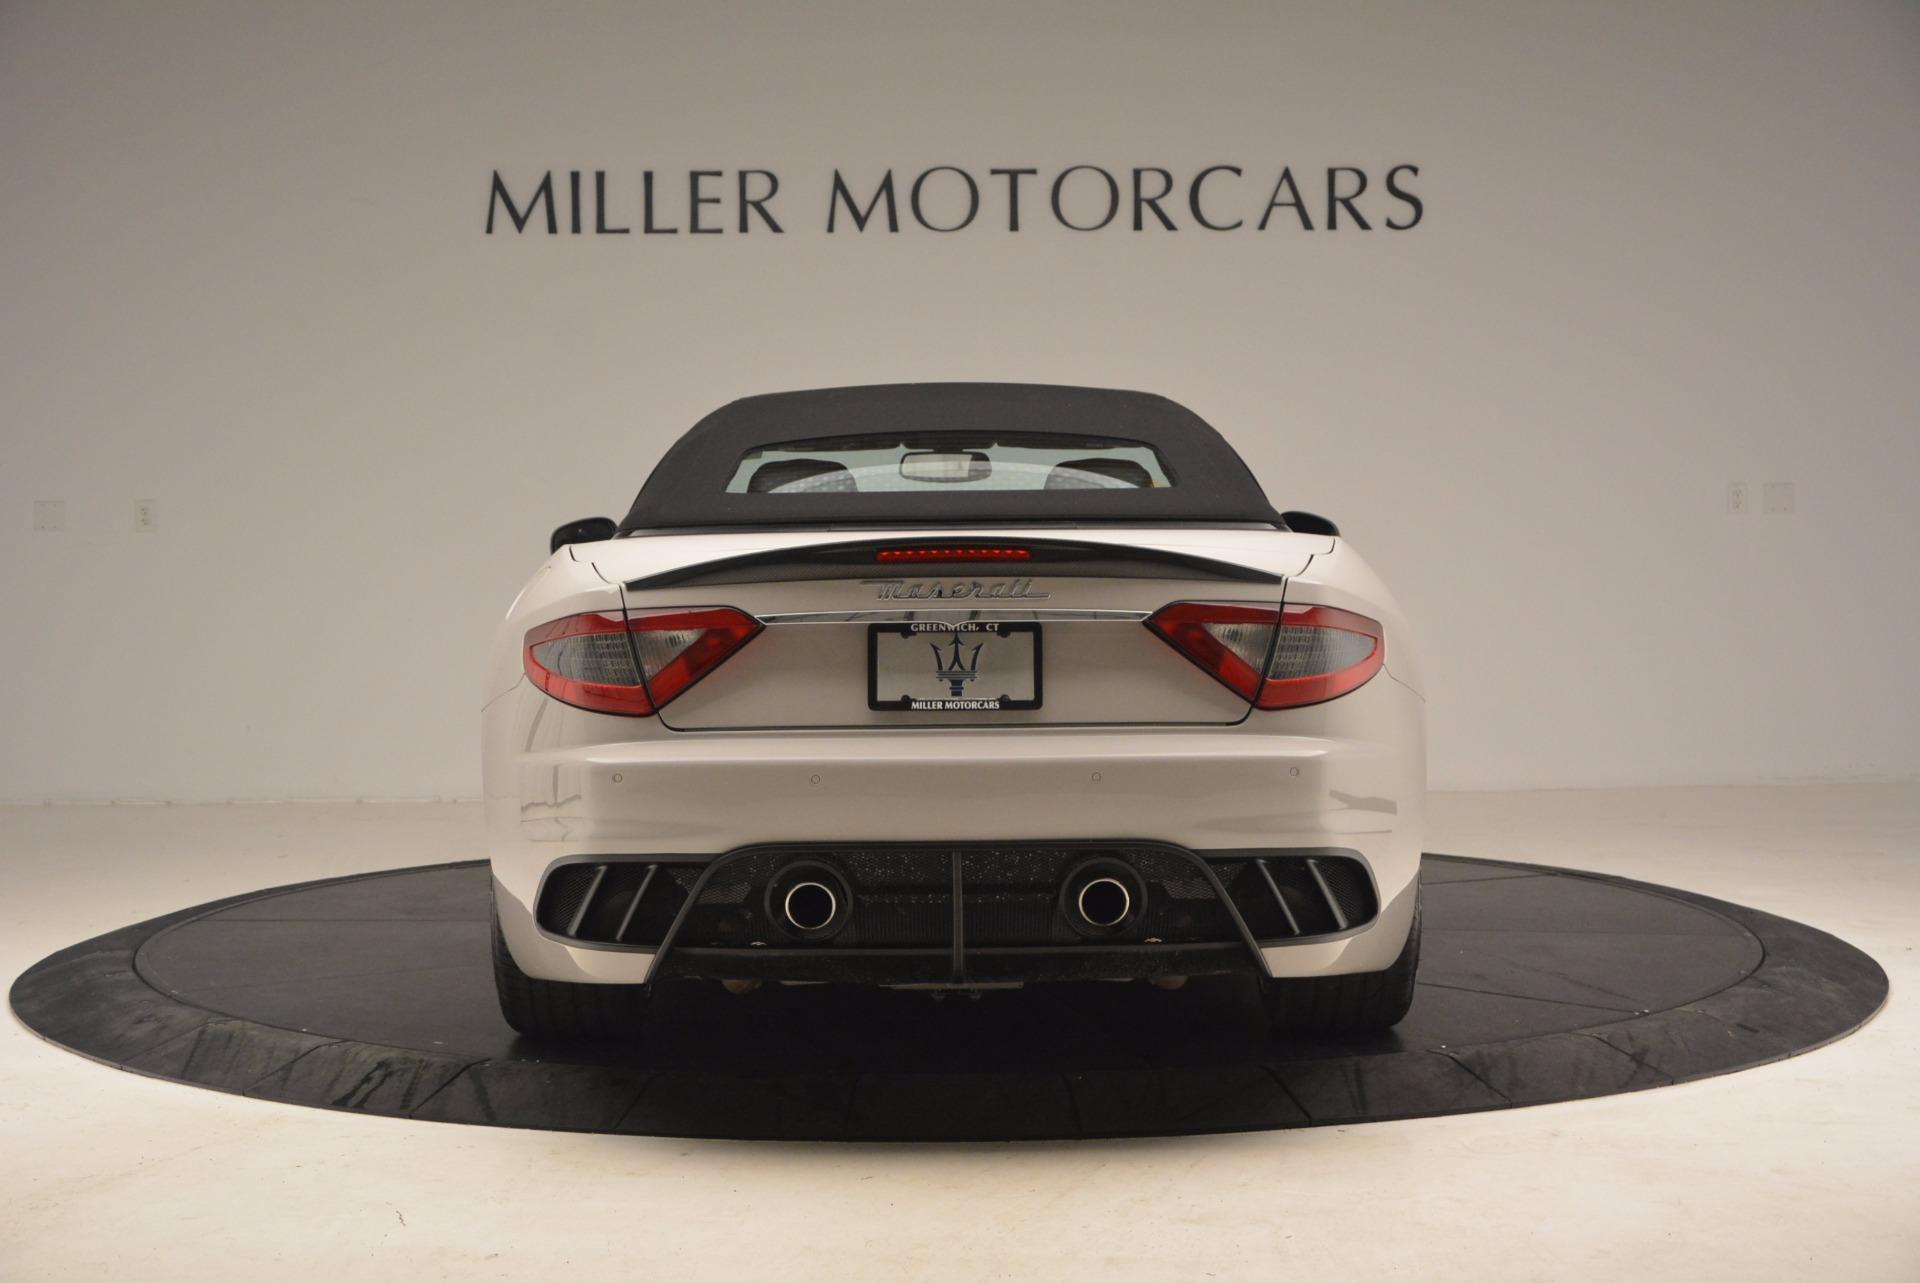 Used 2015 Maserati GranTurismo MC Centennial